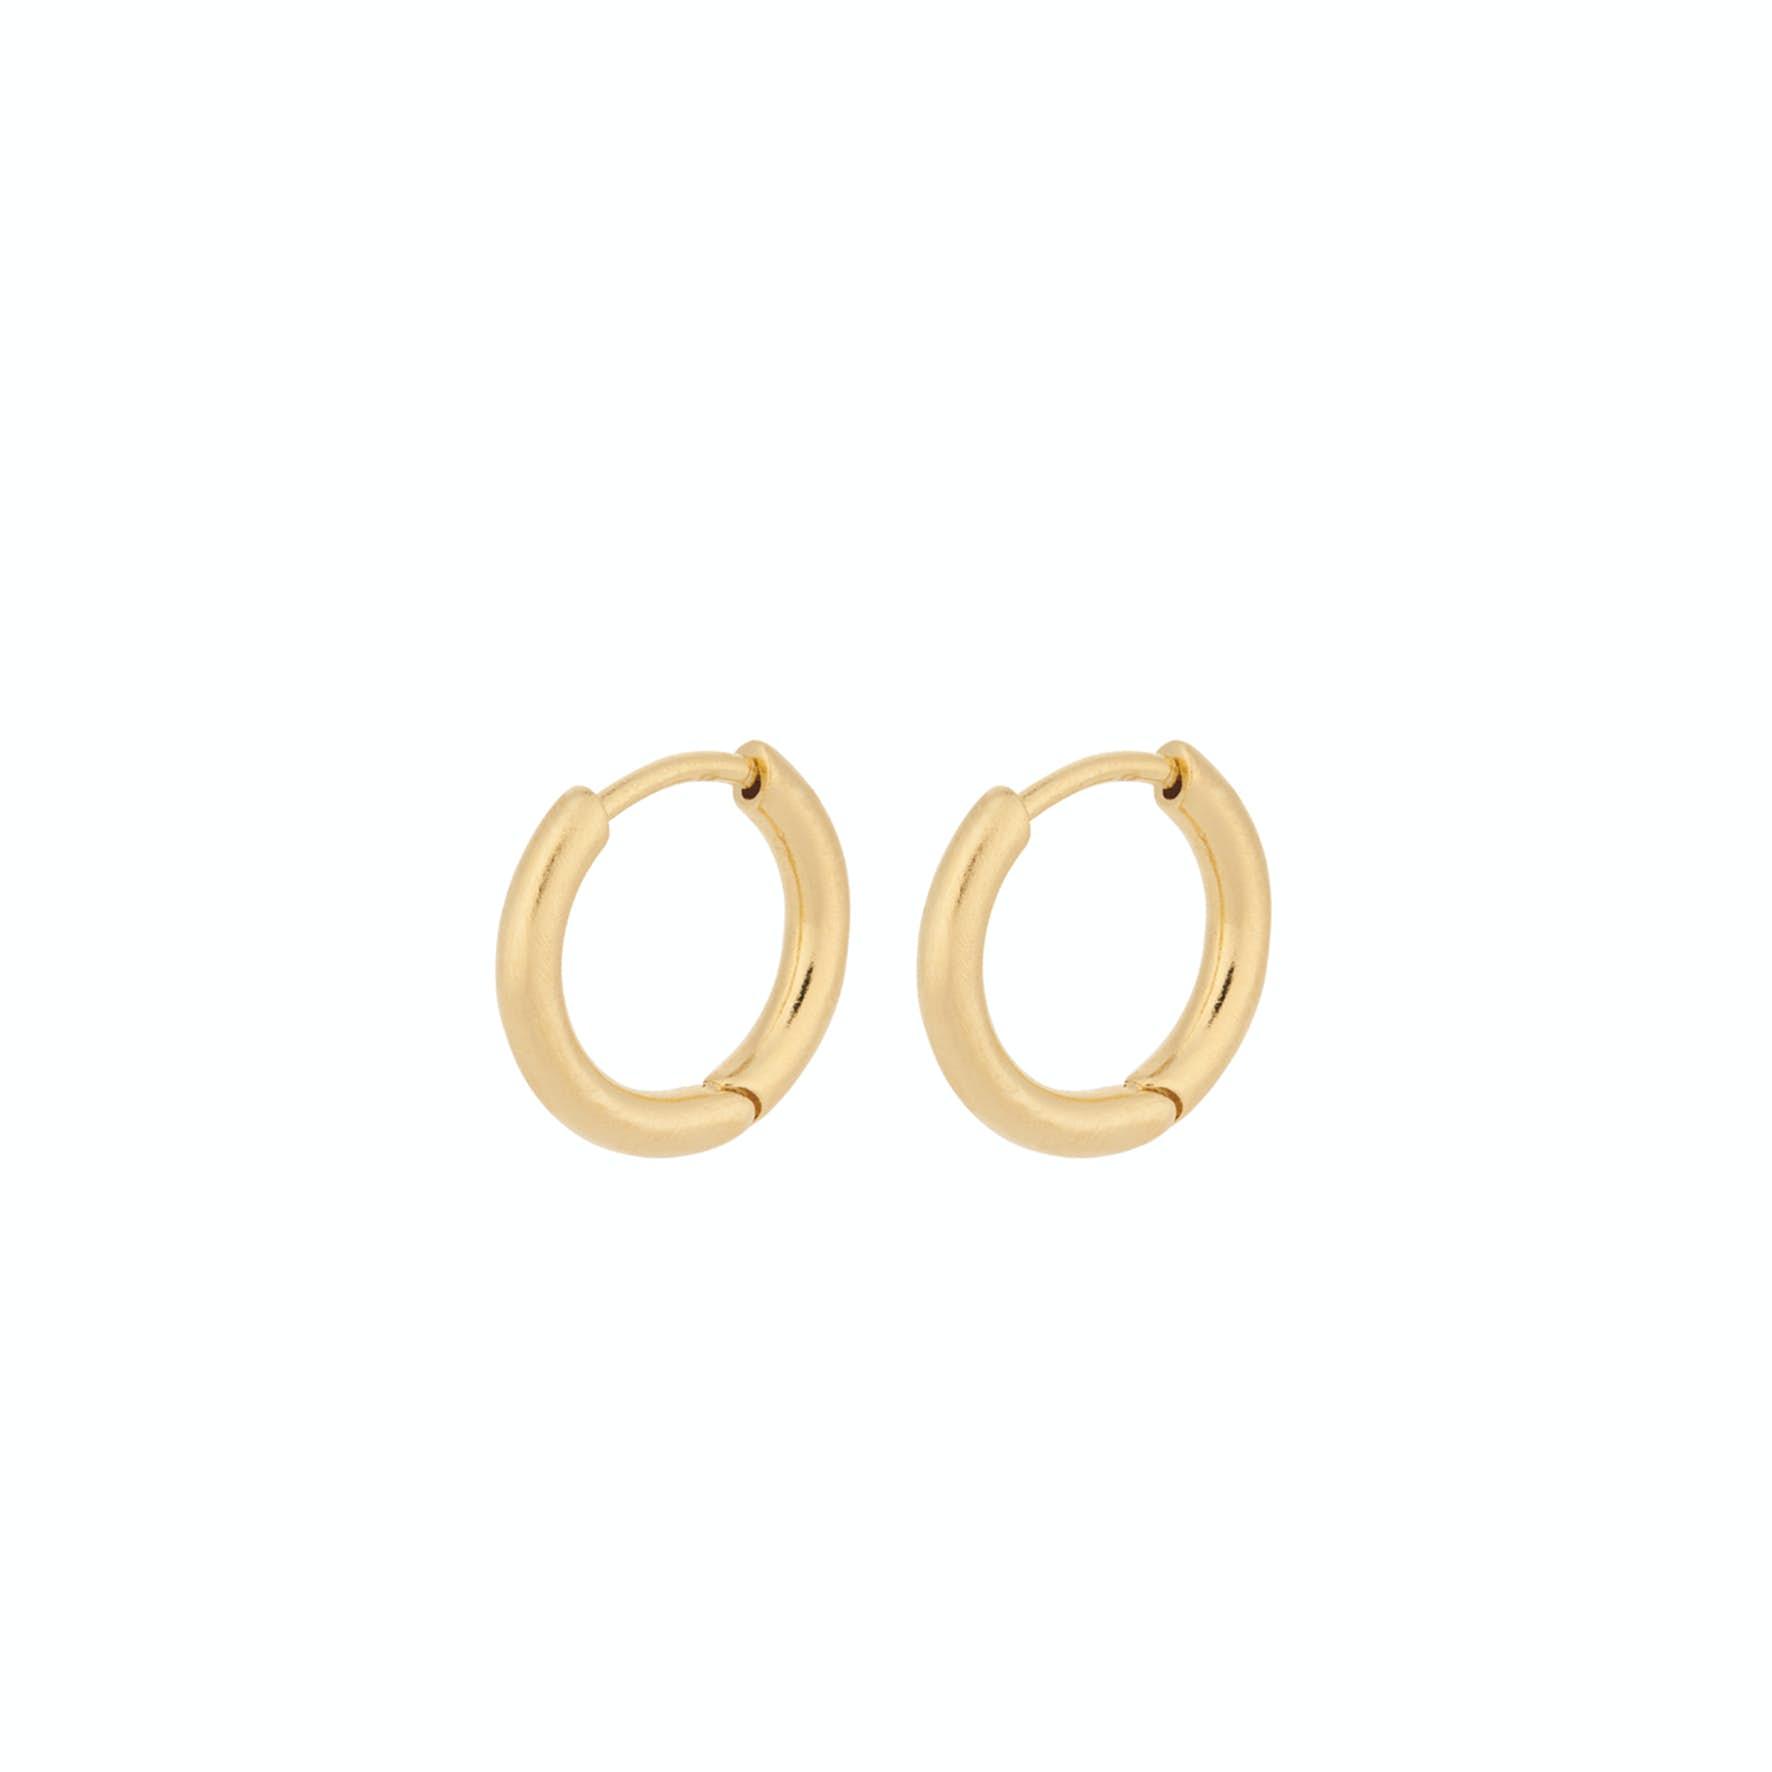 Solid Huggie Earrings von Pernille Corydon in Vergoldet-Silber Sterling 925